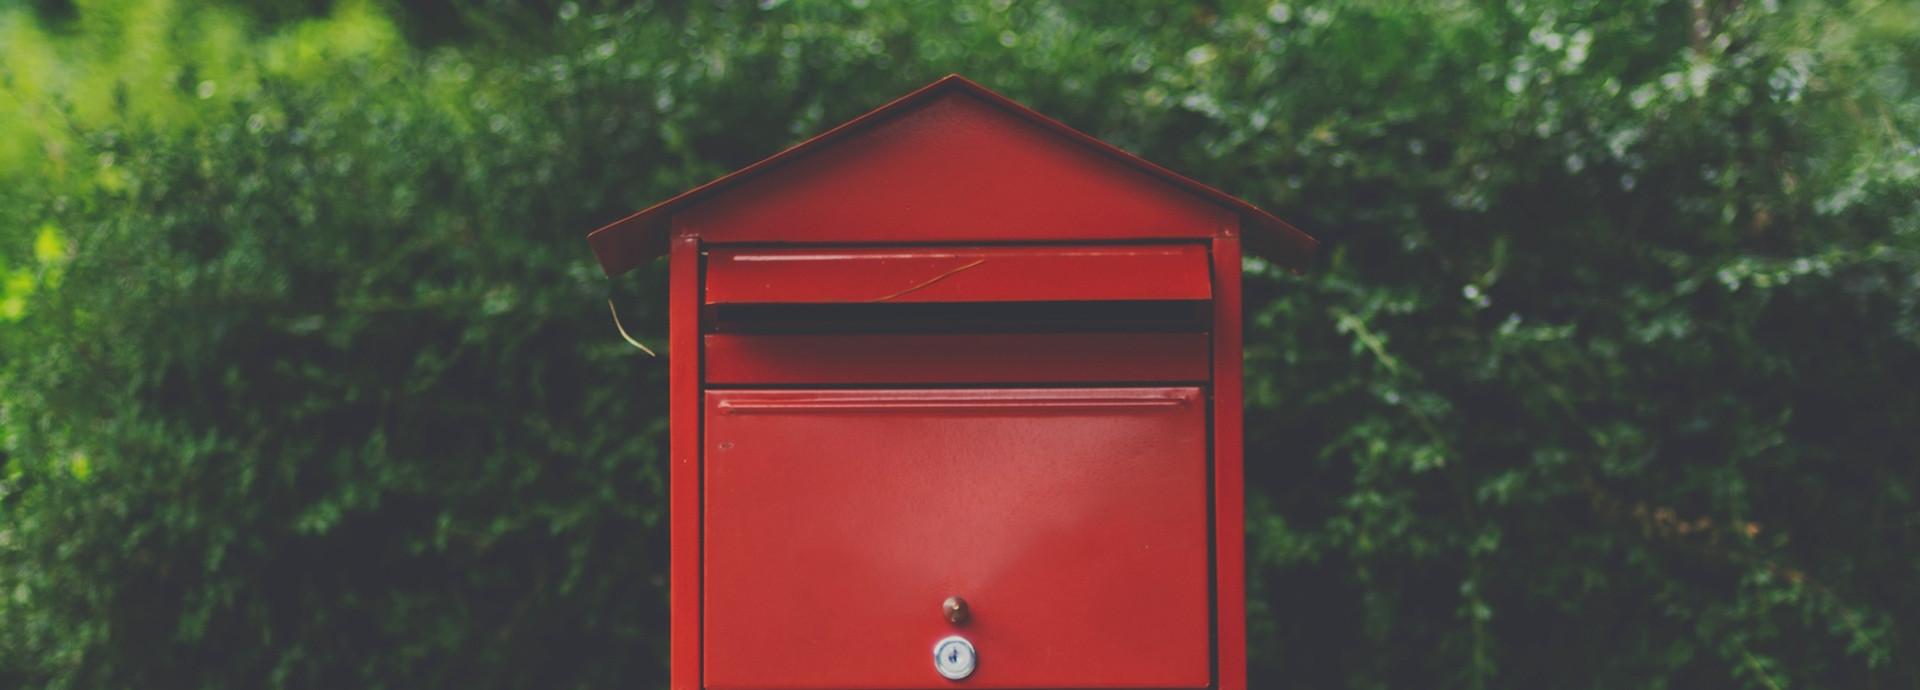 Postes Canada - Mail Montenach